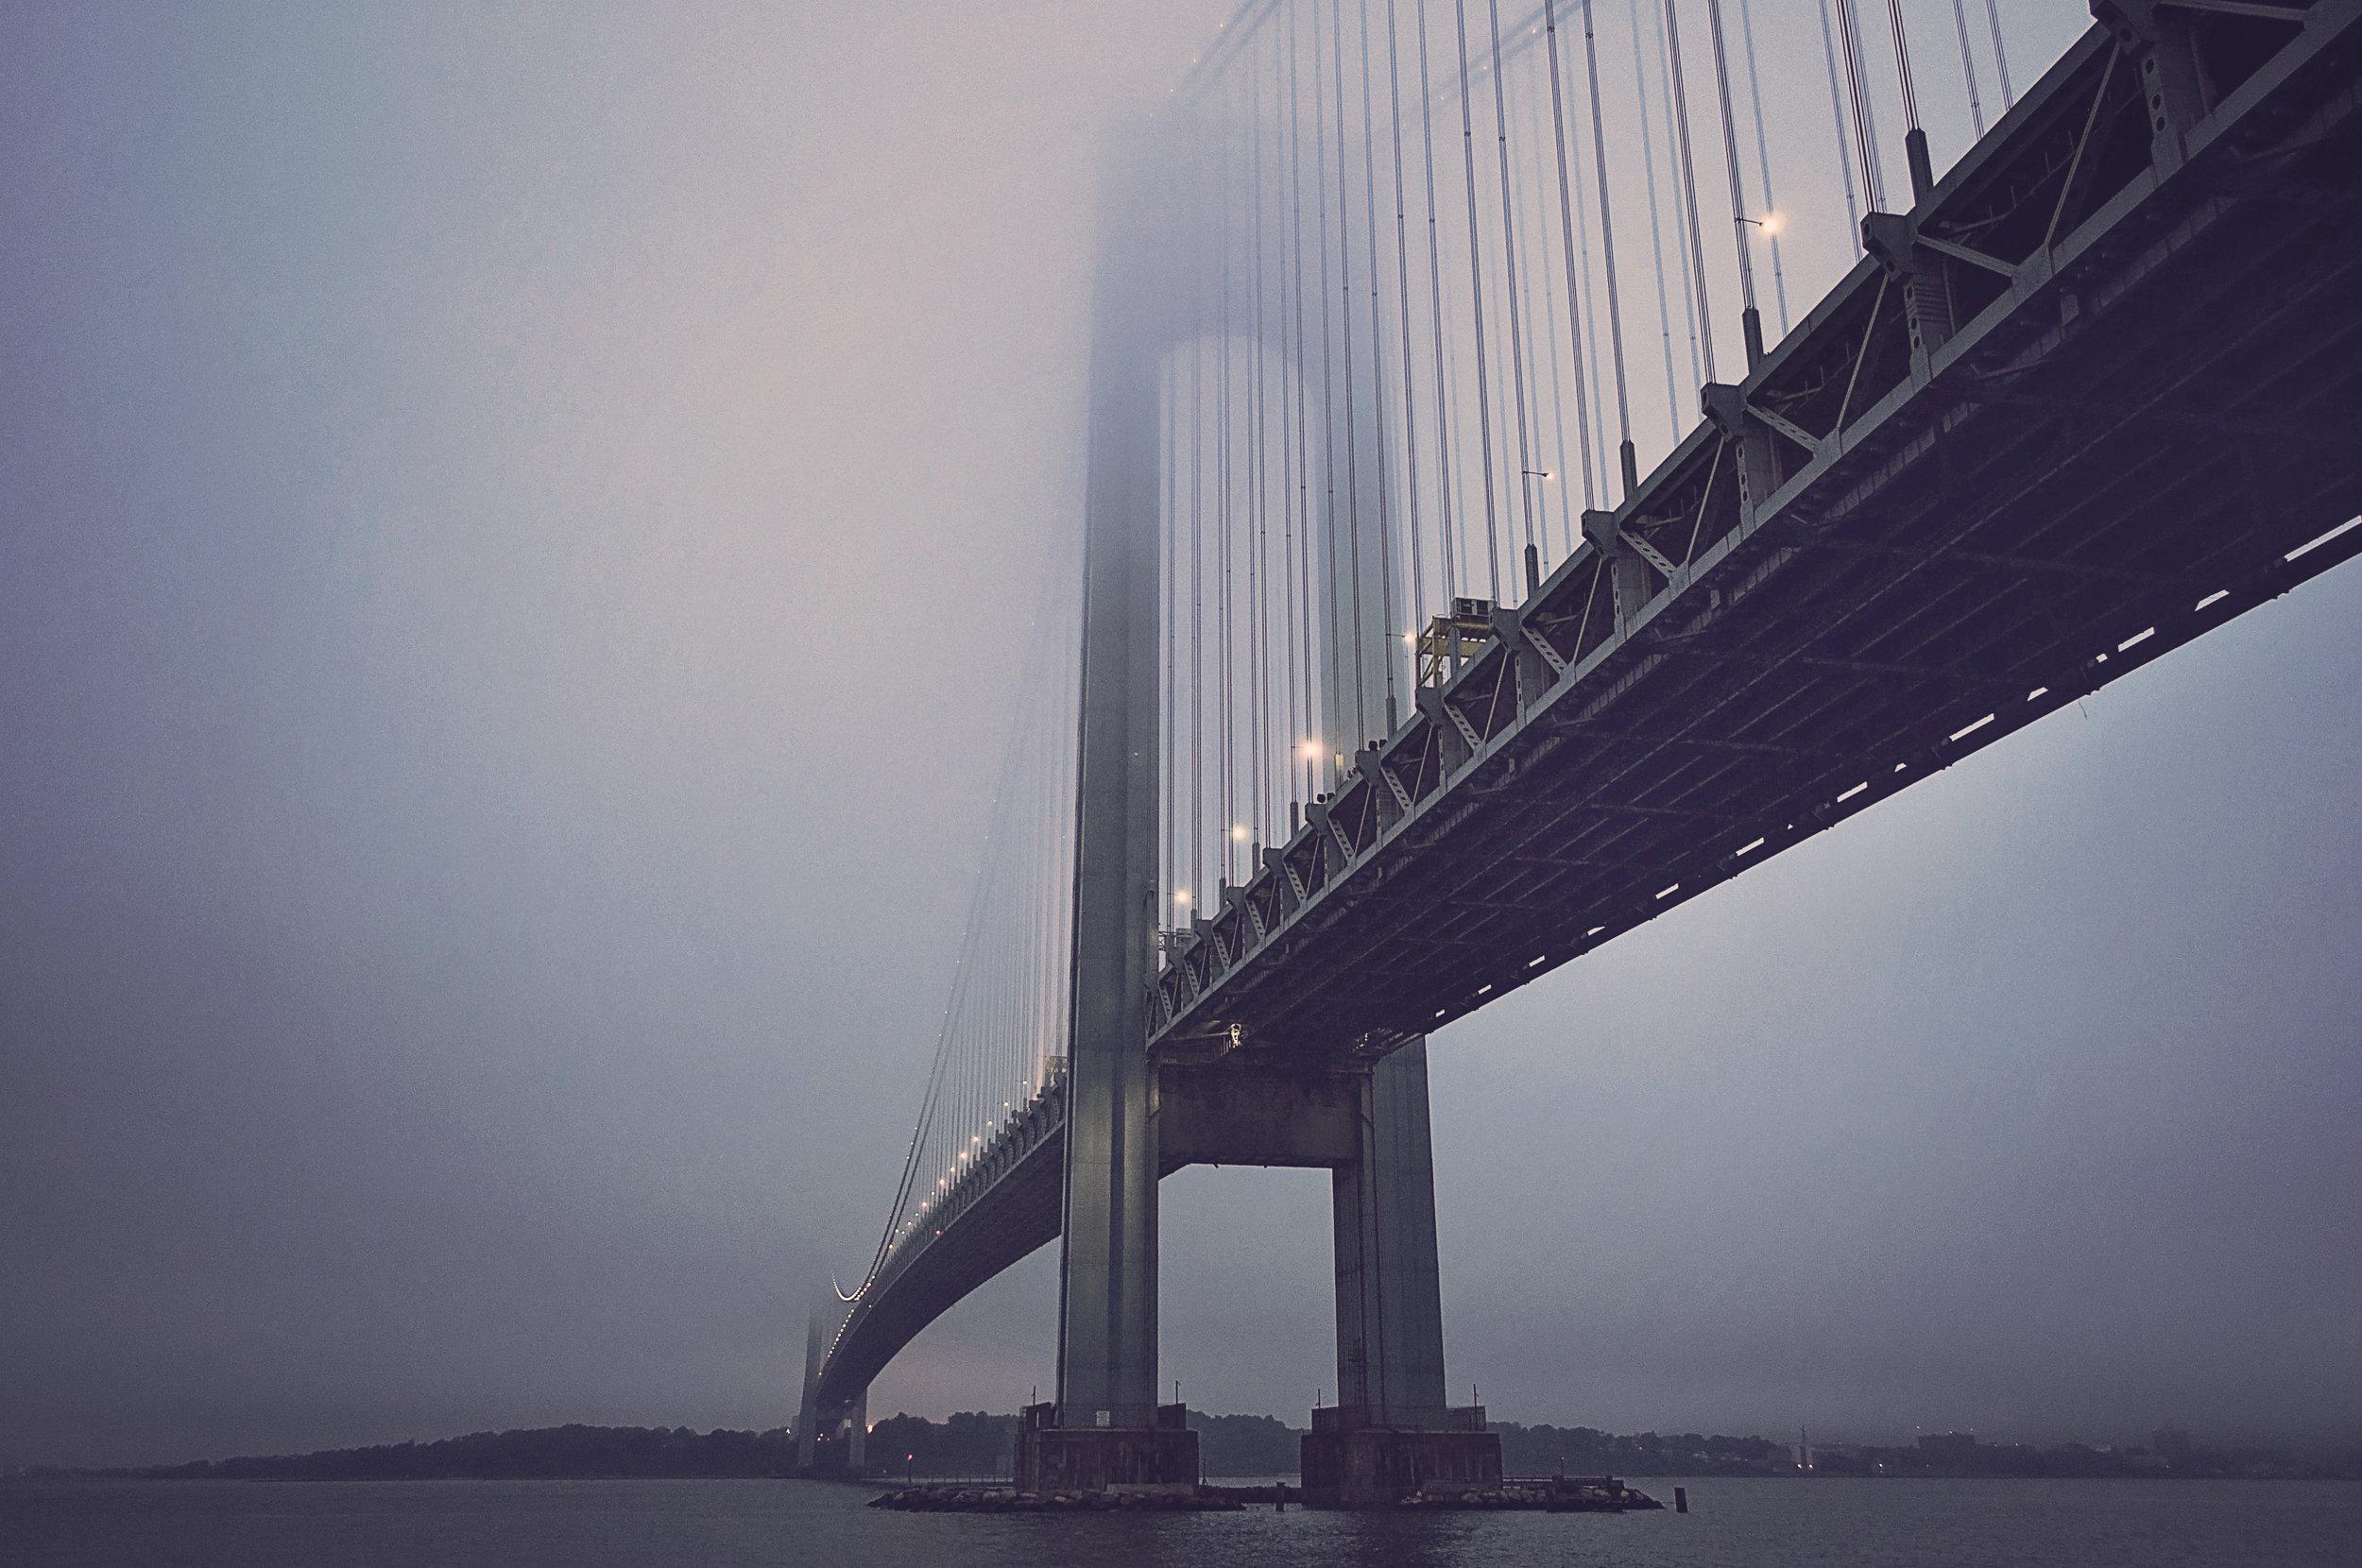 How to Build a Troll-Proof Bridge - by Kiyash Monsef